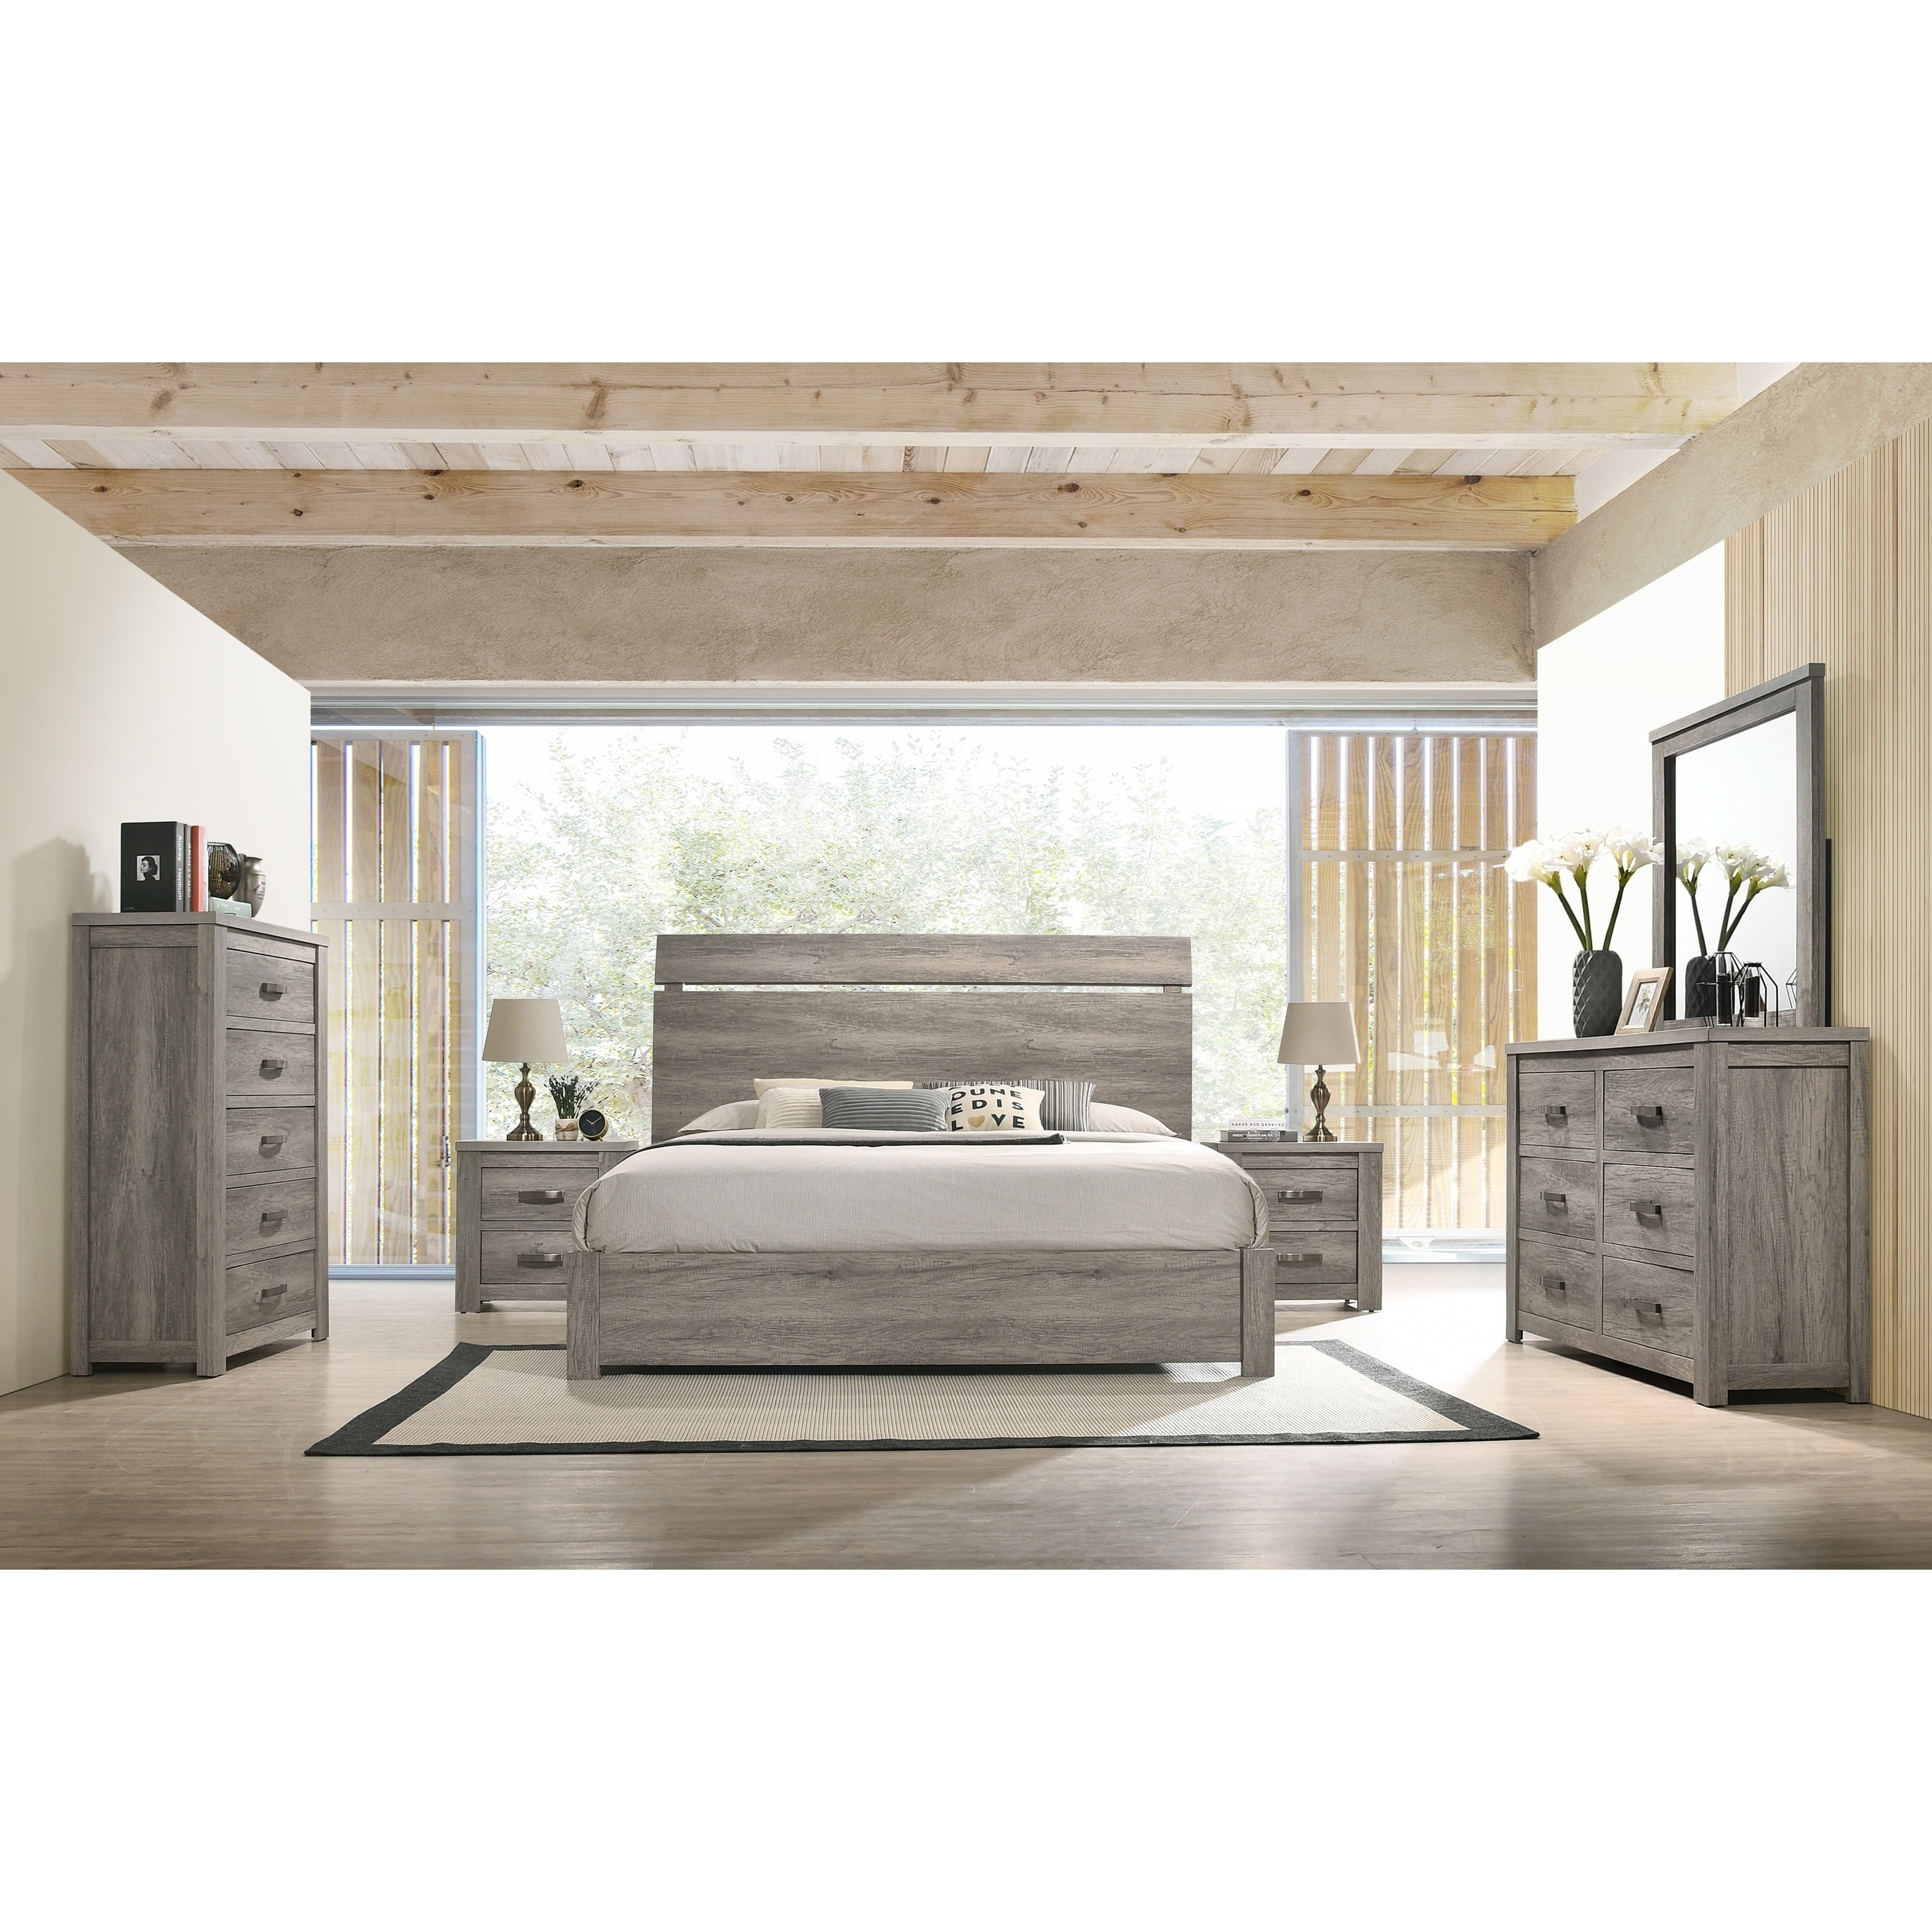 The Gray Barn Rousham Garden Weathered Grey Wood 12-piece Bedroom Set